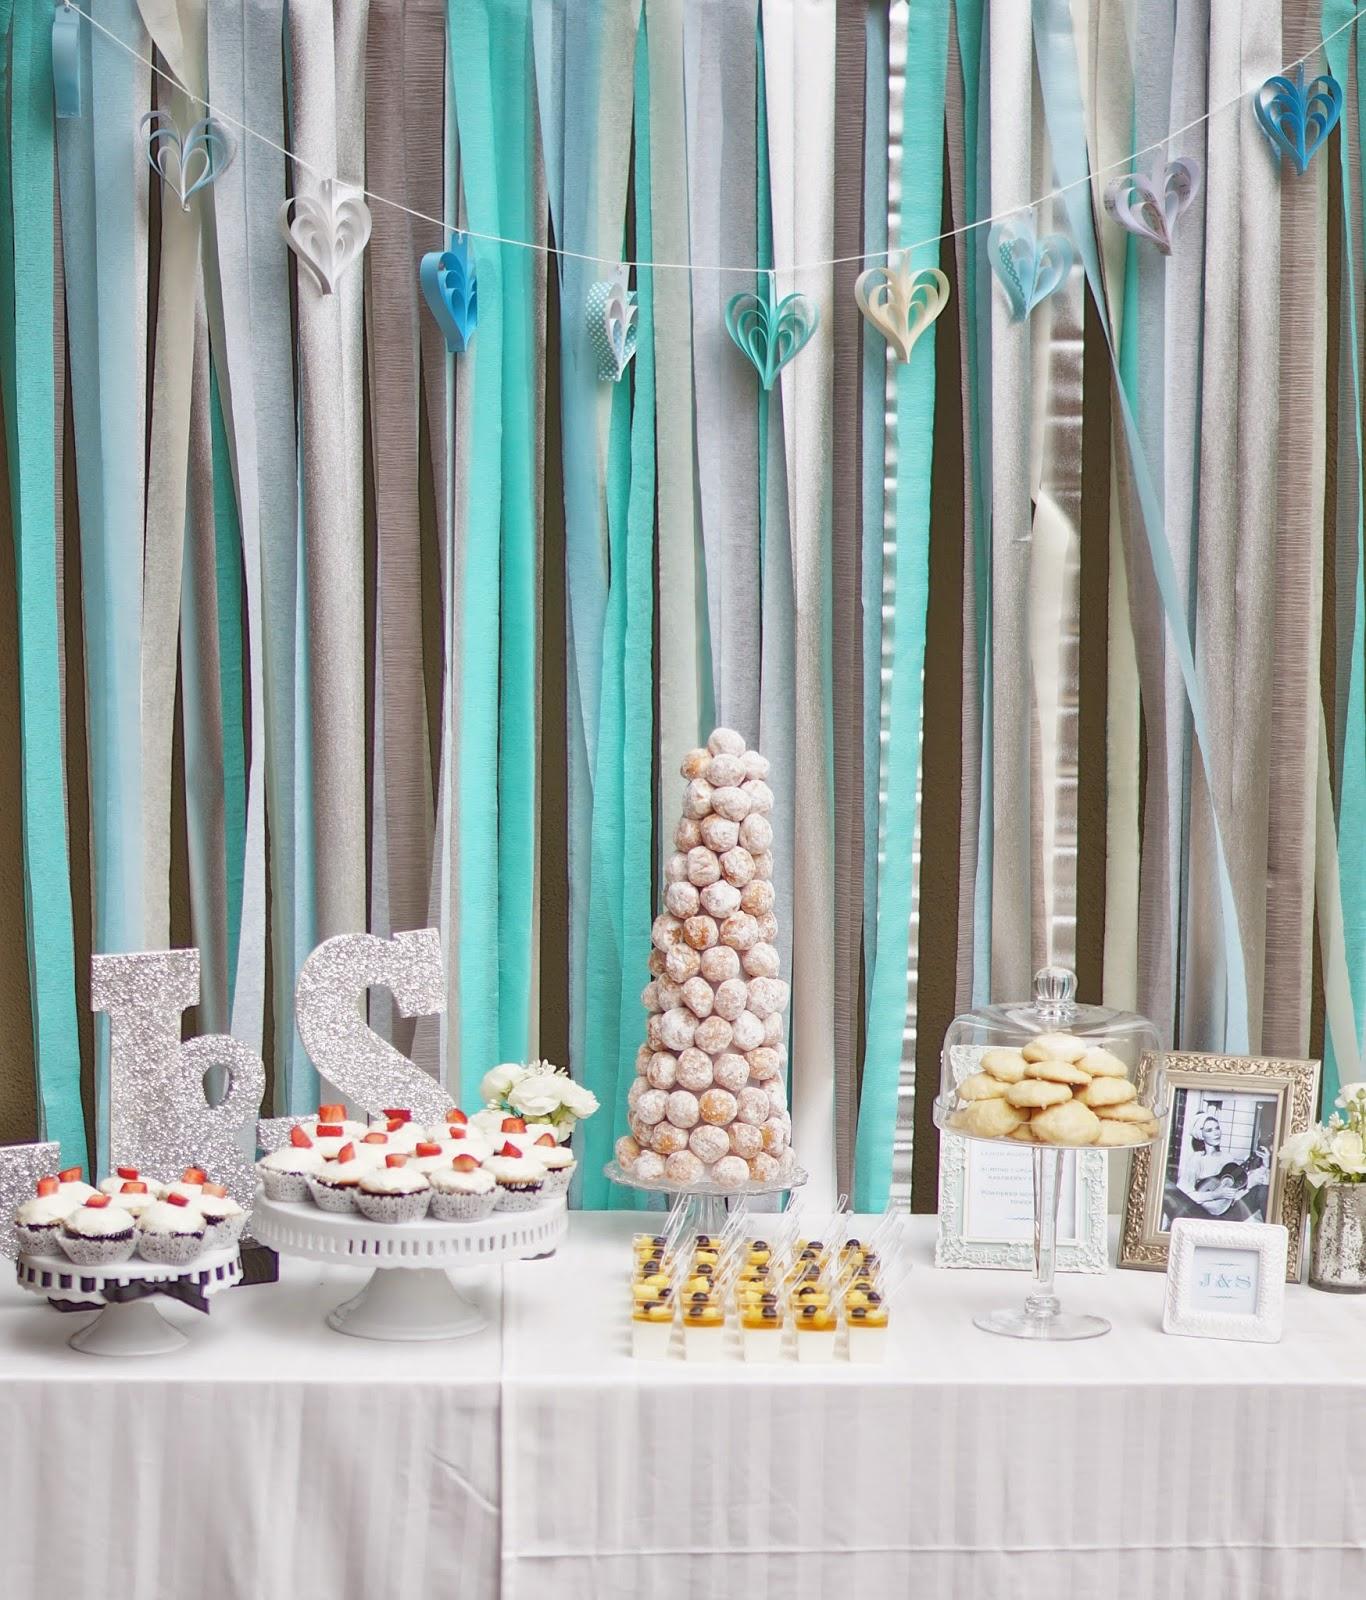 Tiffany Wedding Ideas: Life By Appointment: Breakfast At Tiffany's Bridal Shower